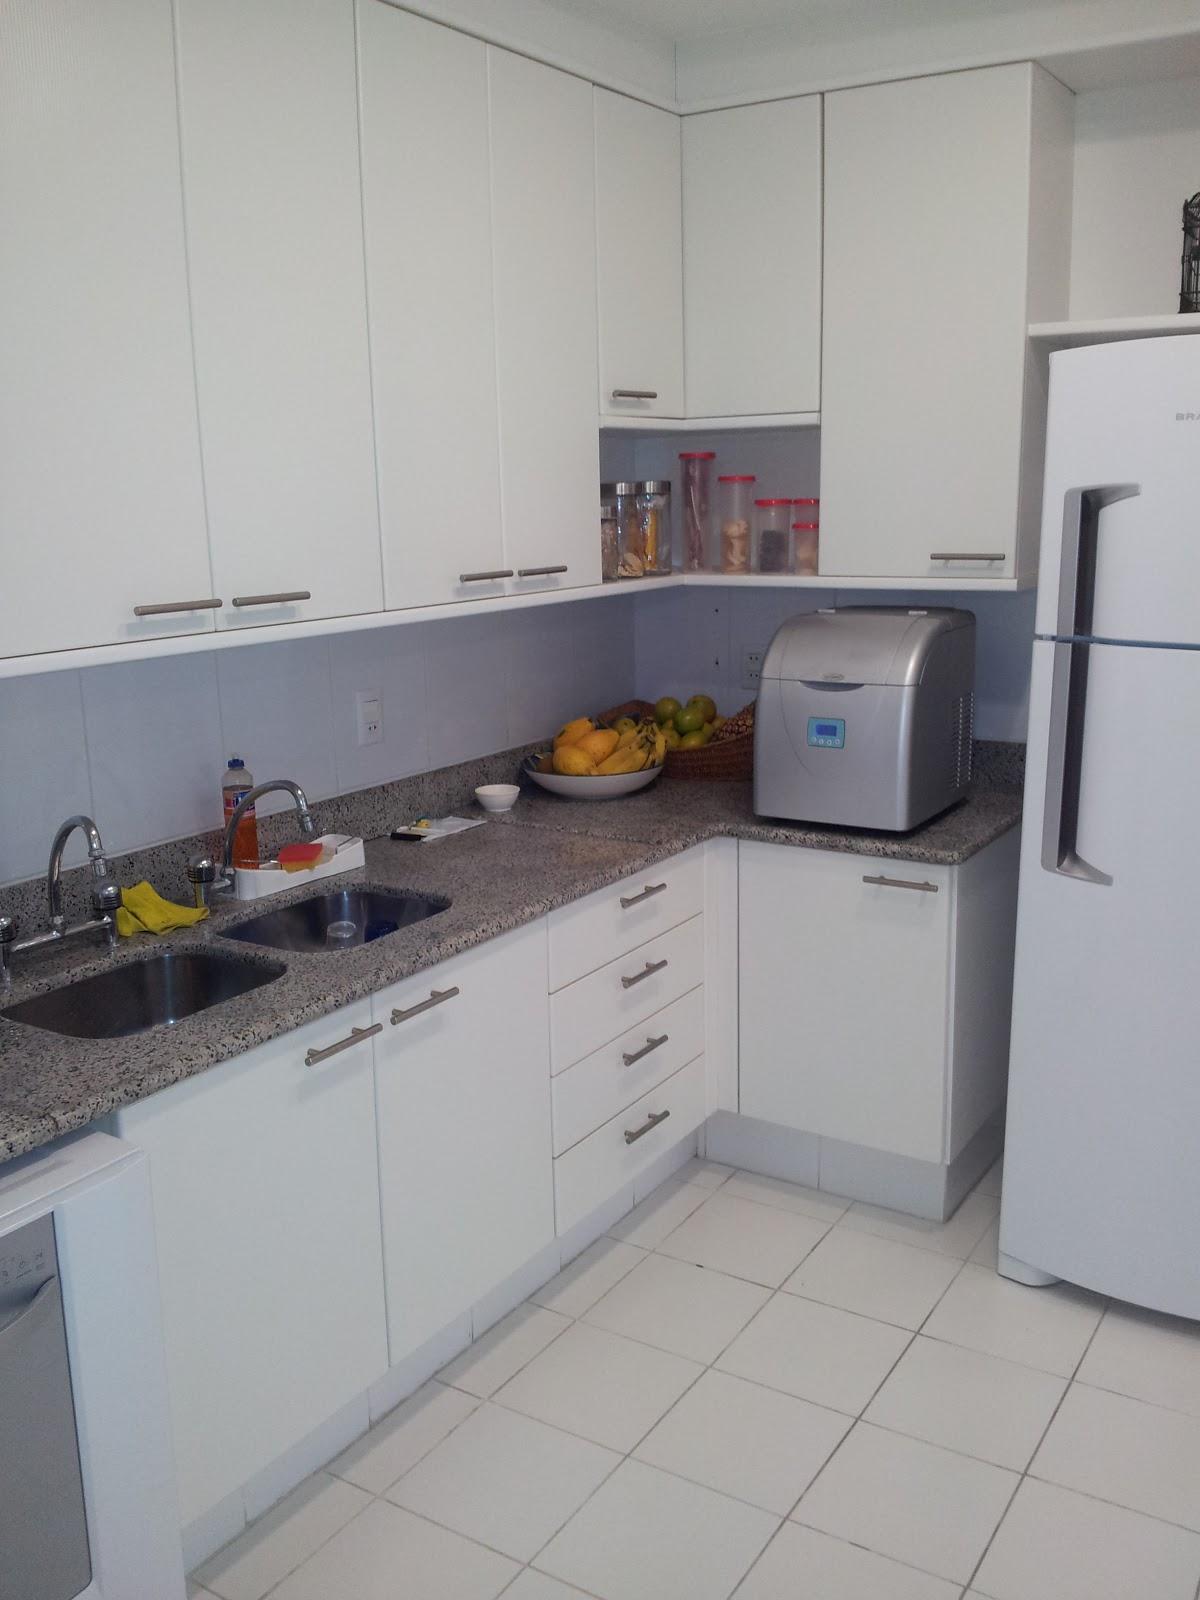 ReginaSegura. arquitetura: Reforma e Design de Interiores Itanhangá #624842 1200 1600